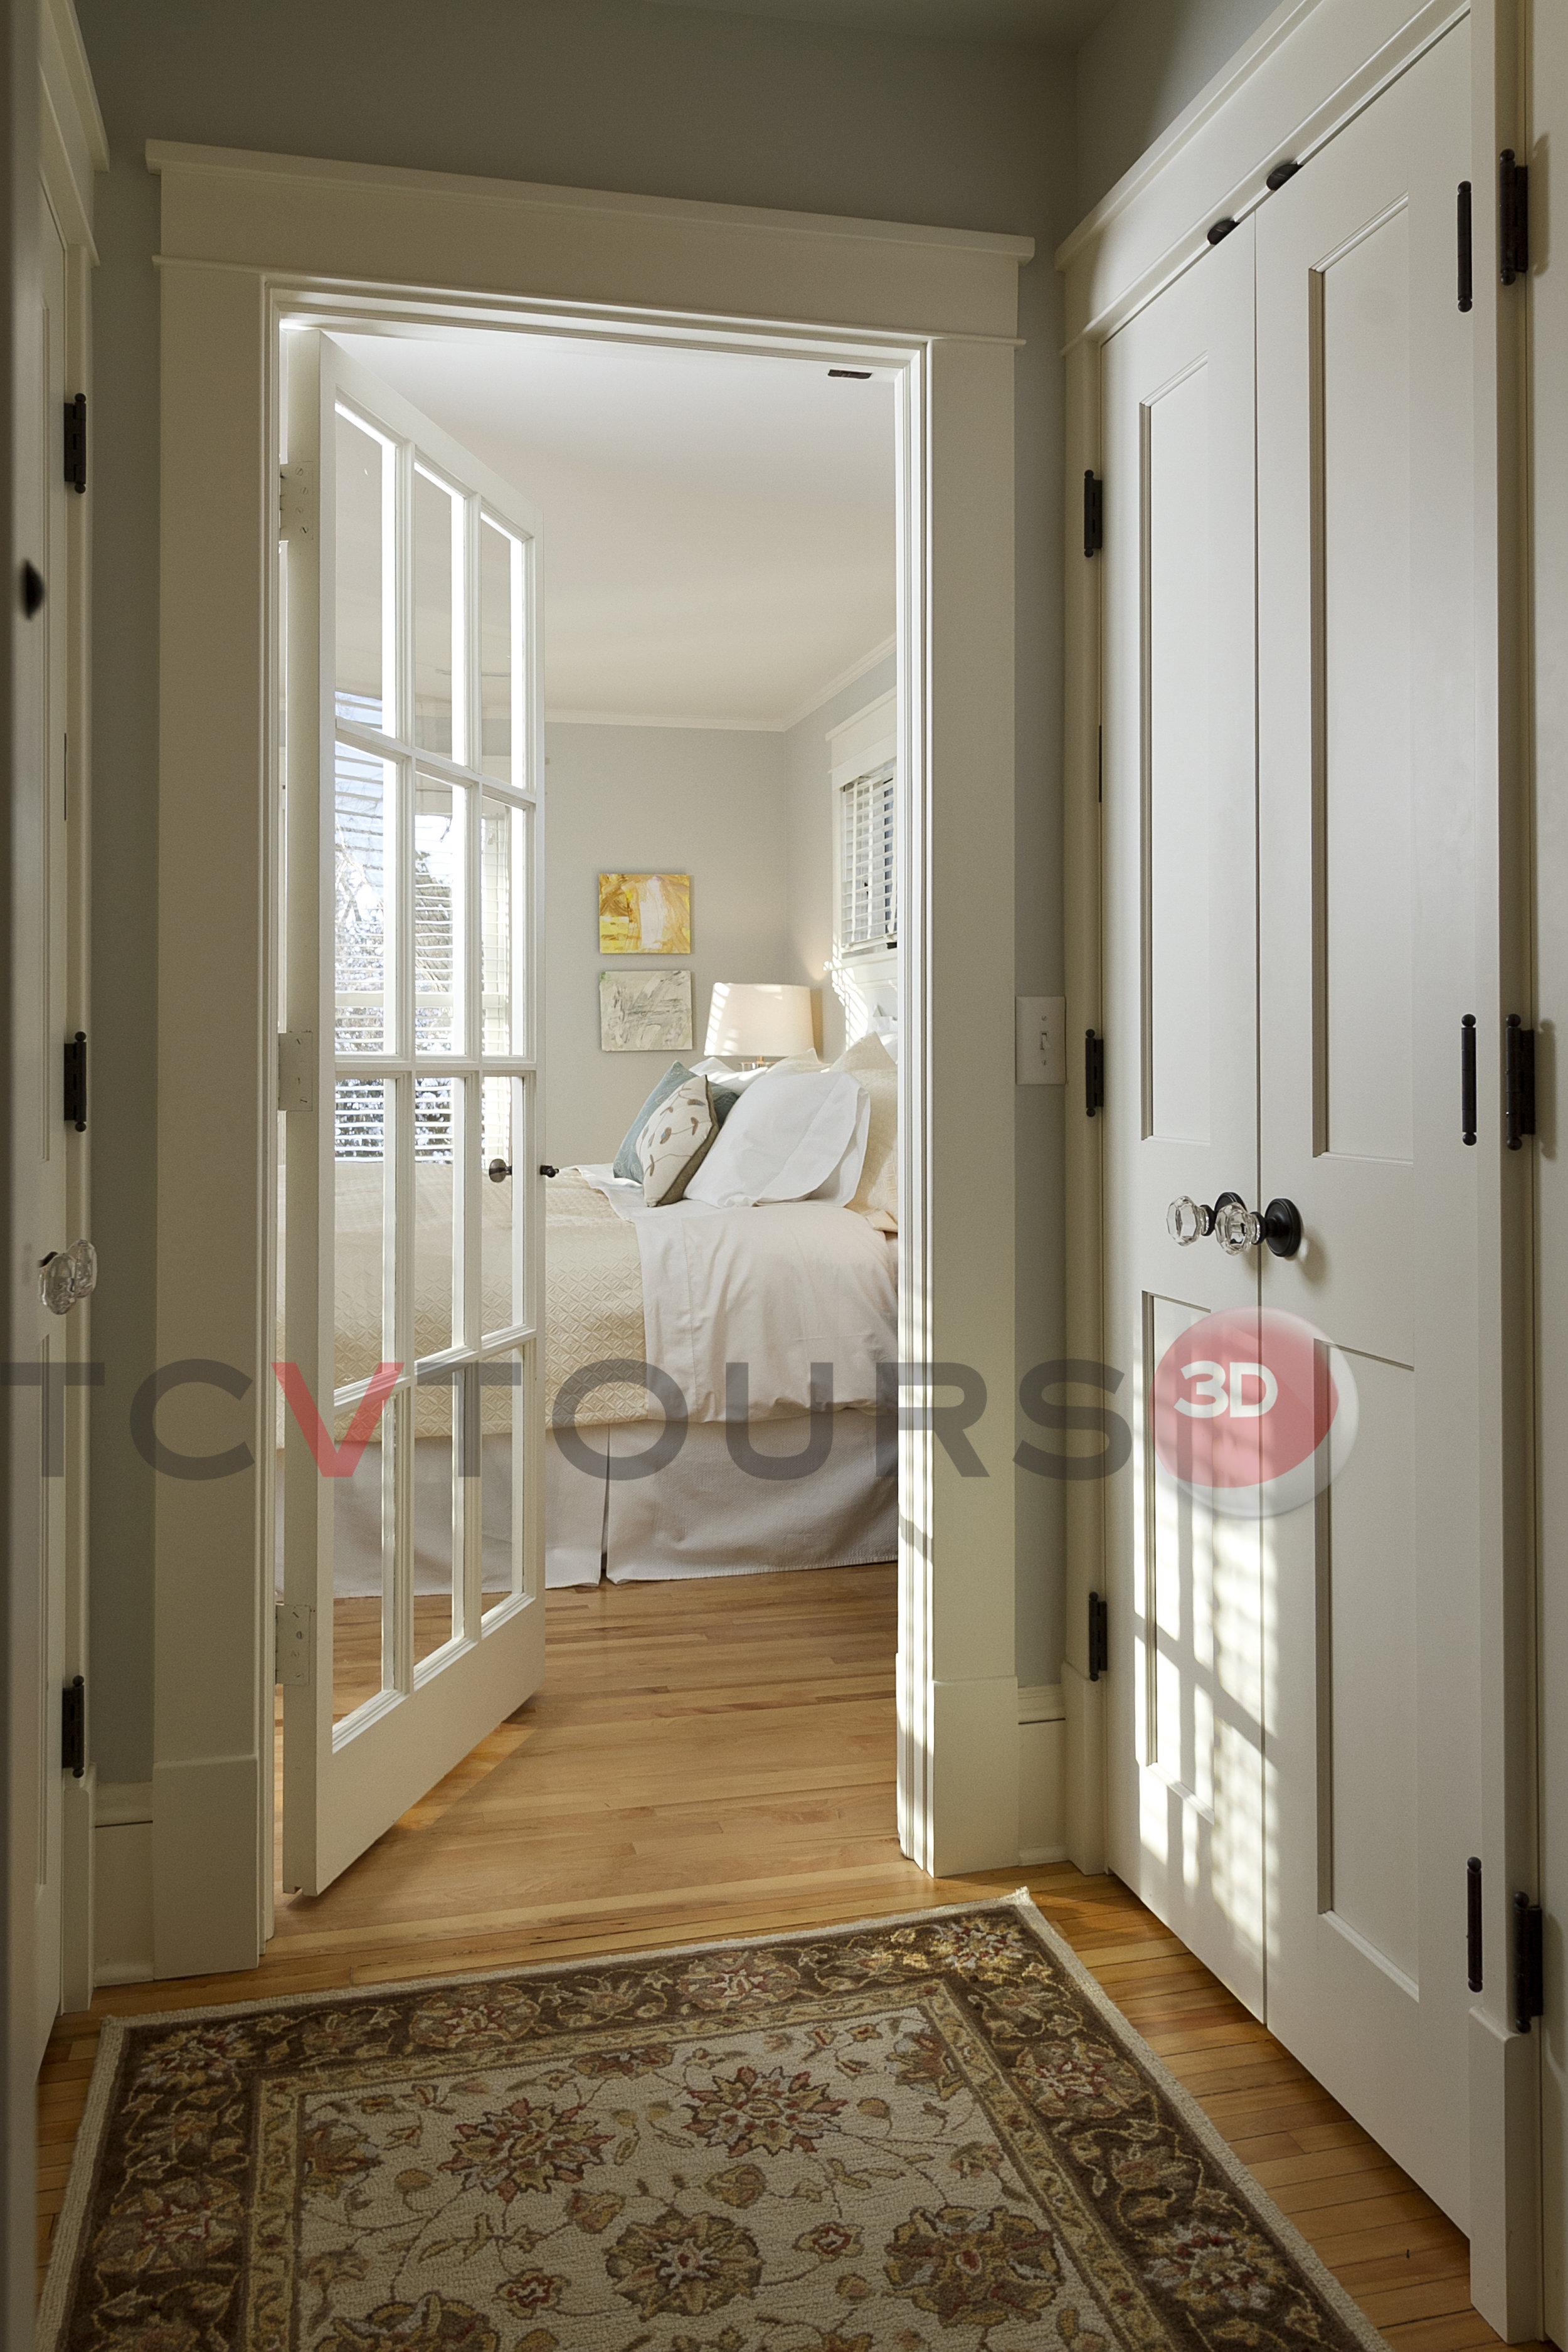 027_master doorway wide H20.jpg